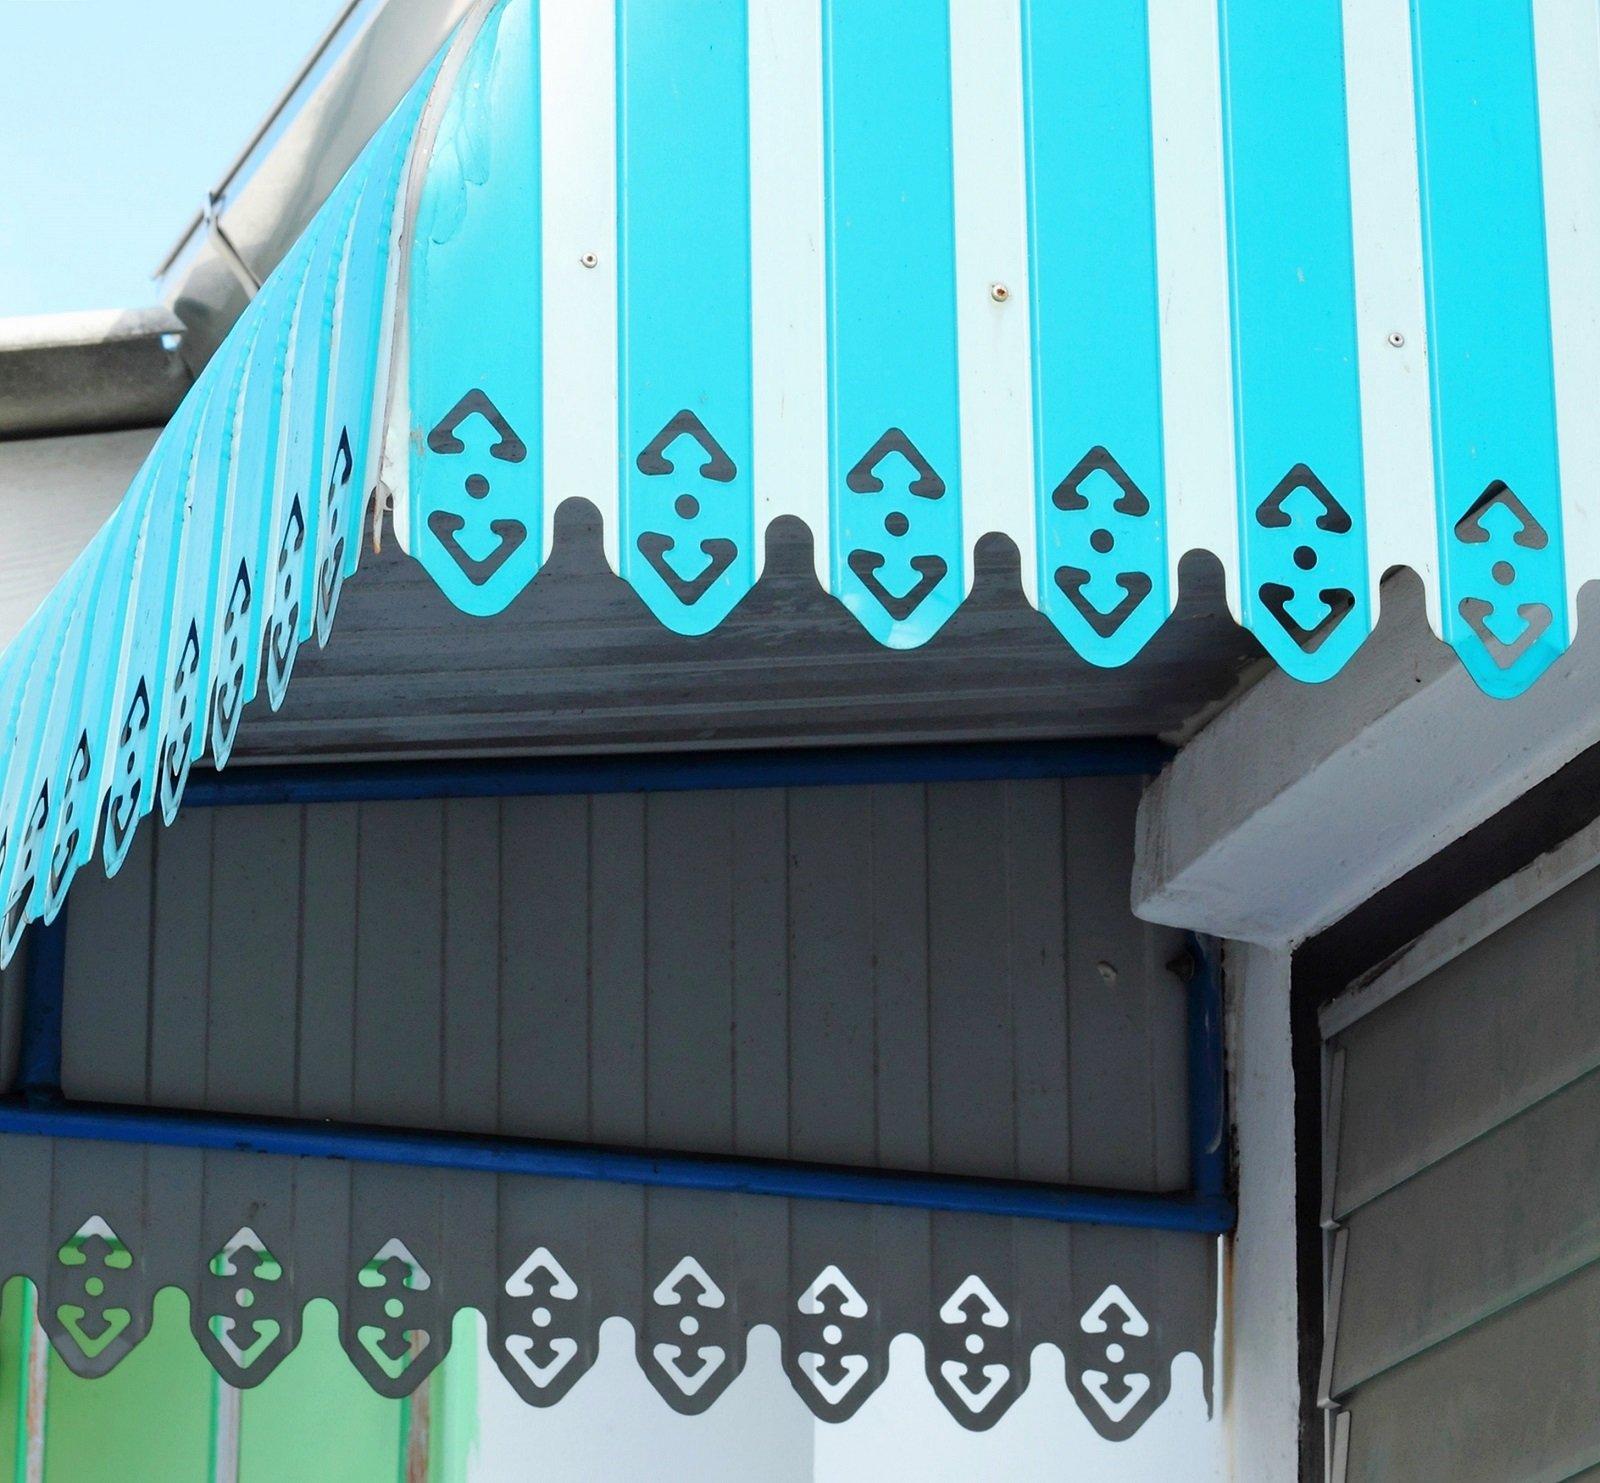 Finestra di tendaggio blu e bianca